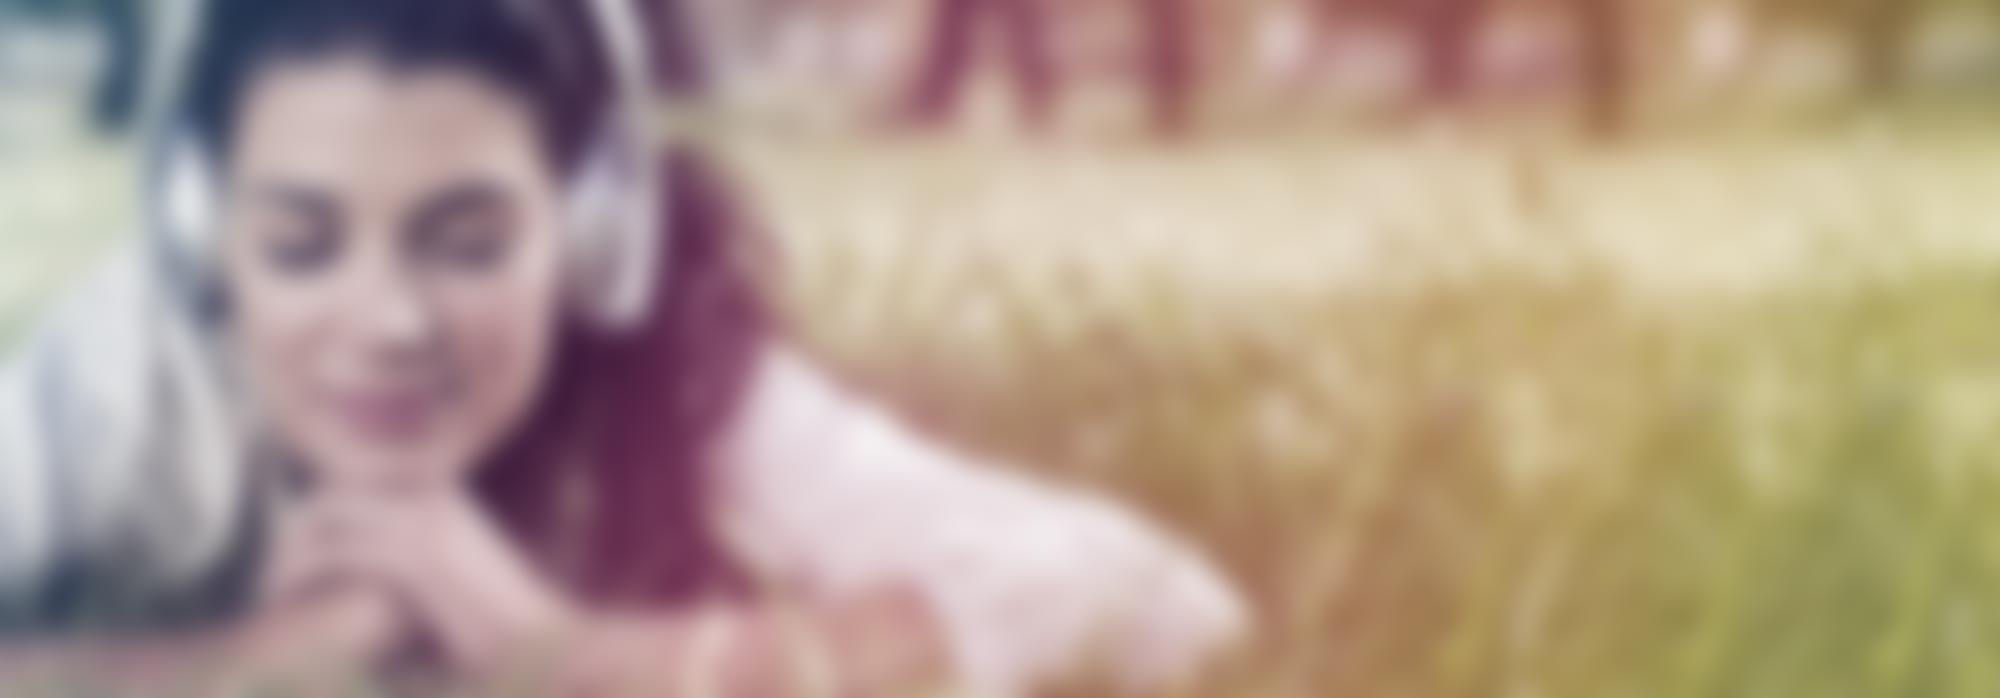 Blurred background image for banner 1